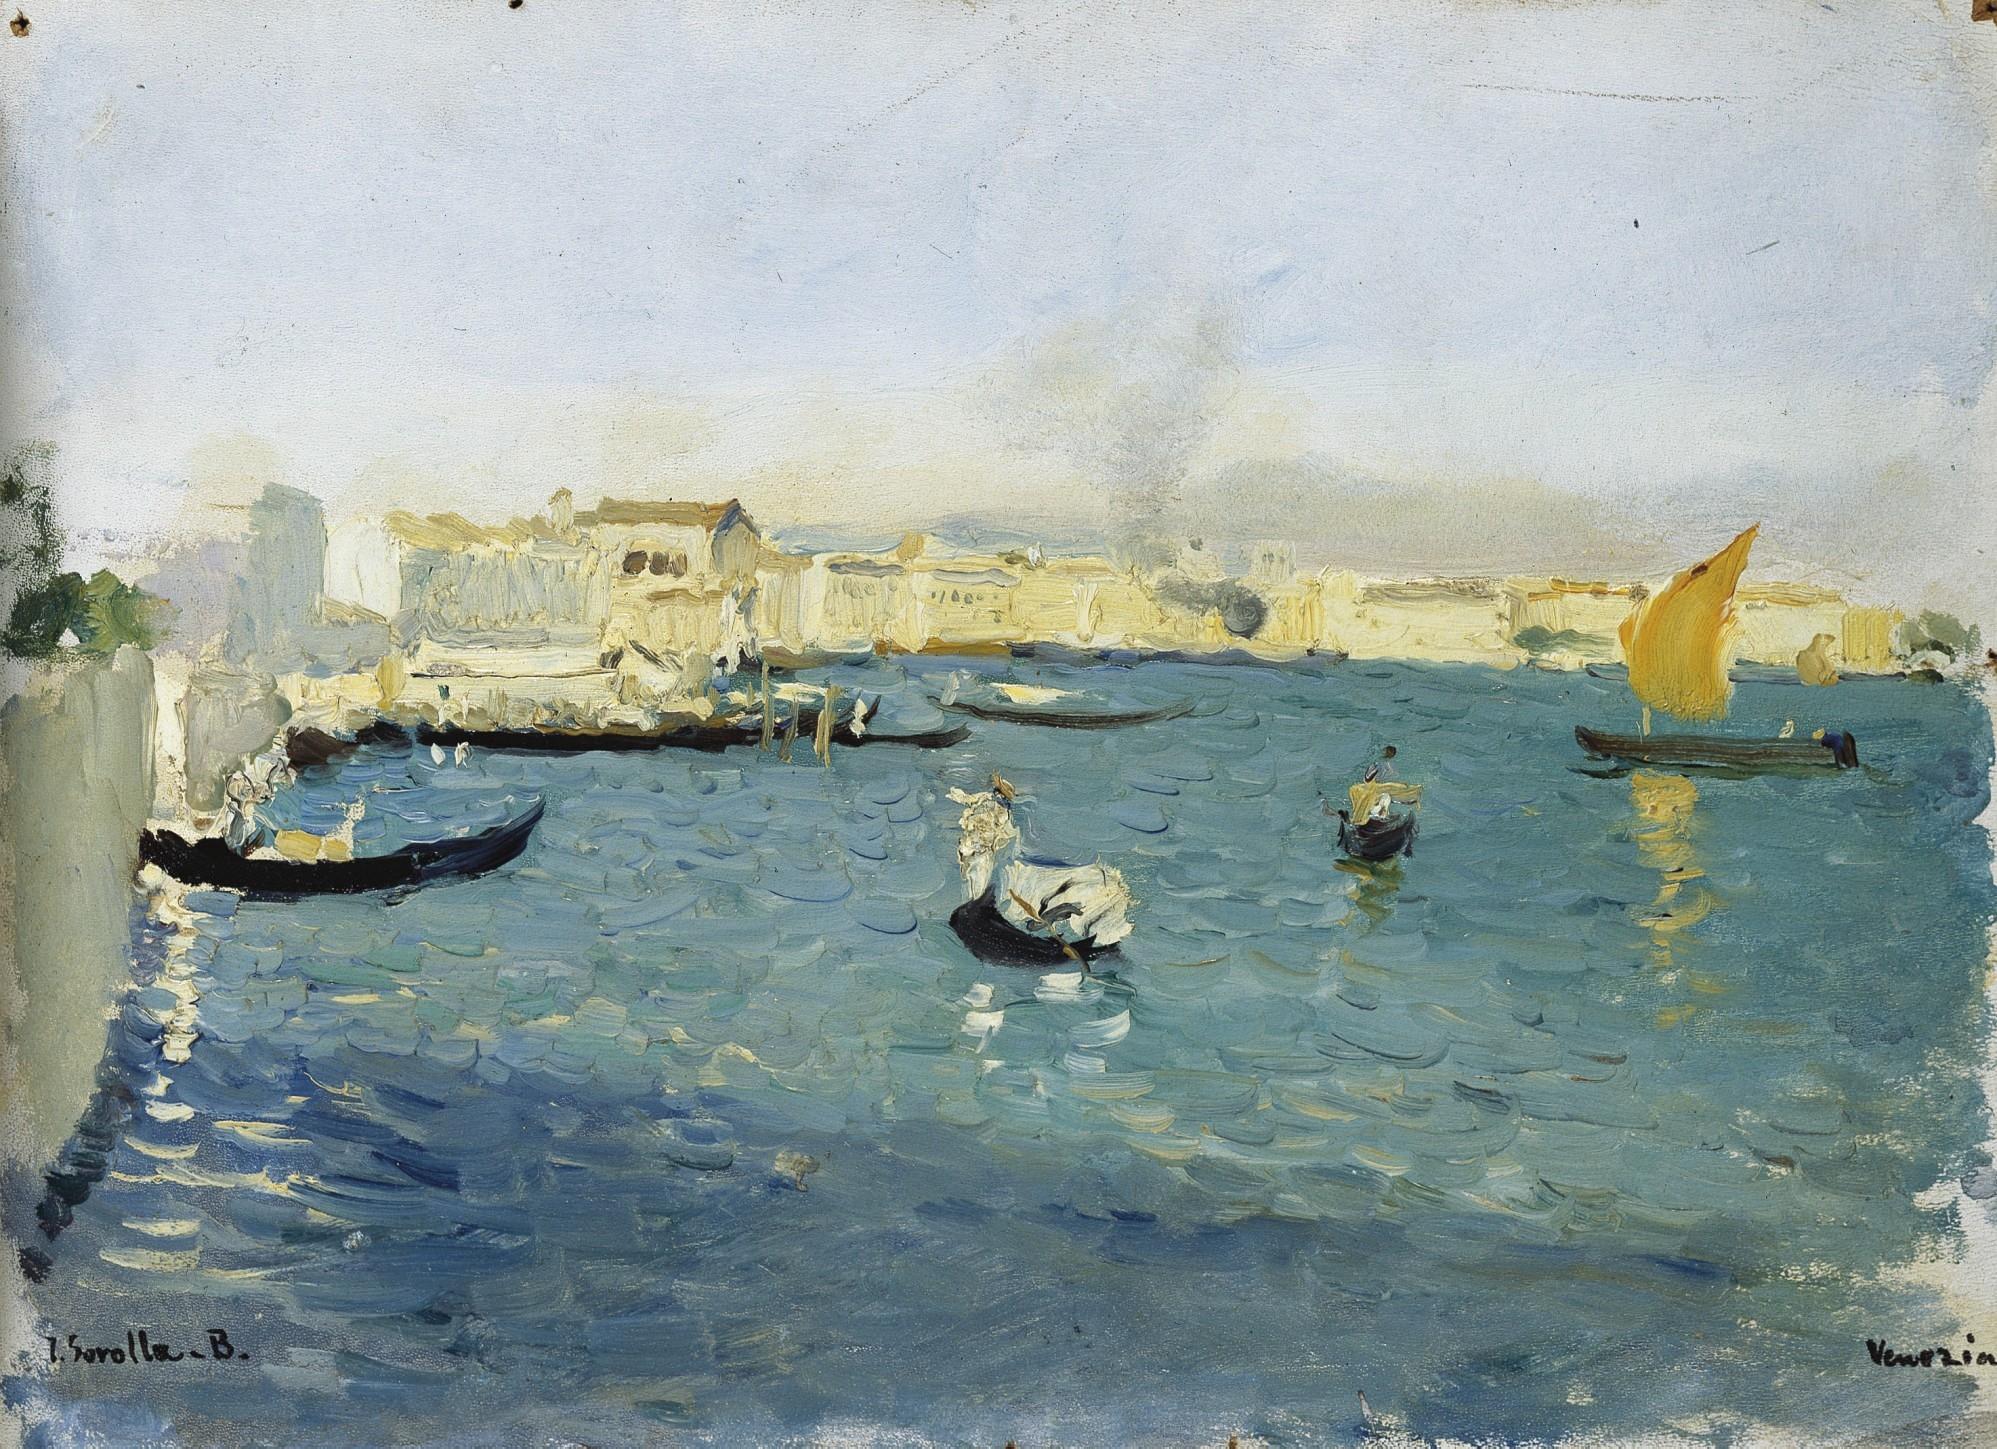 https://upload.wikimedia.org/wikipedia/commons/b/bc/Joaquin_Sorolla_y_Bastida_-_Venecia.jpg